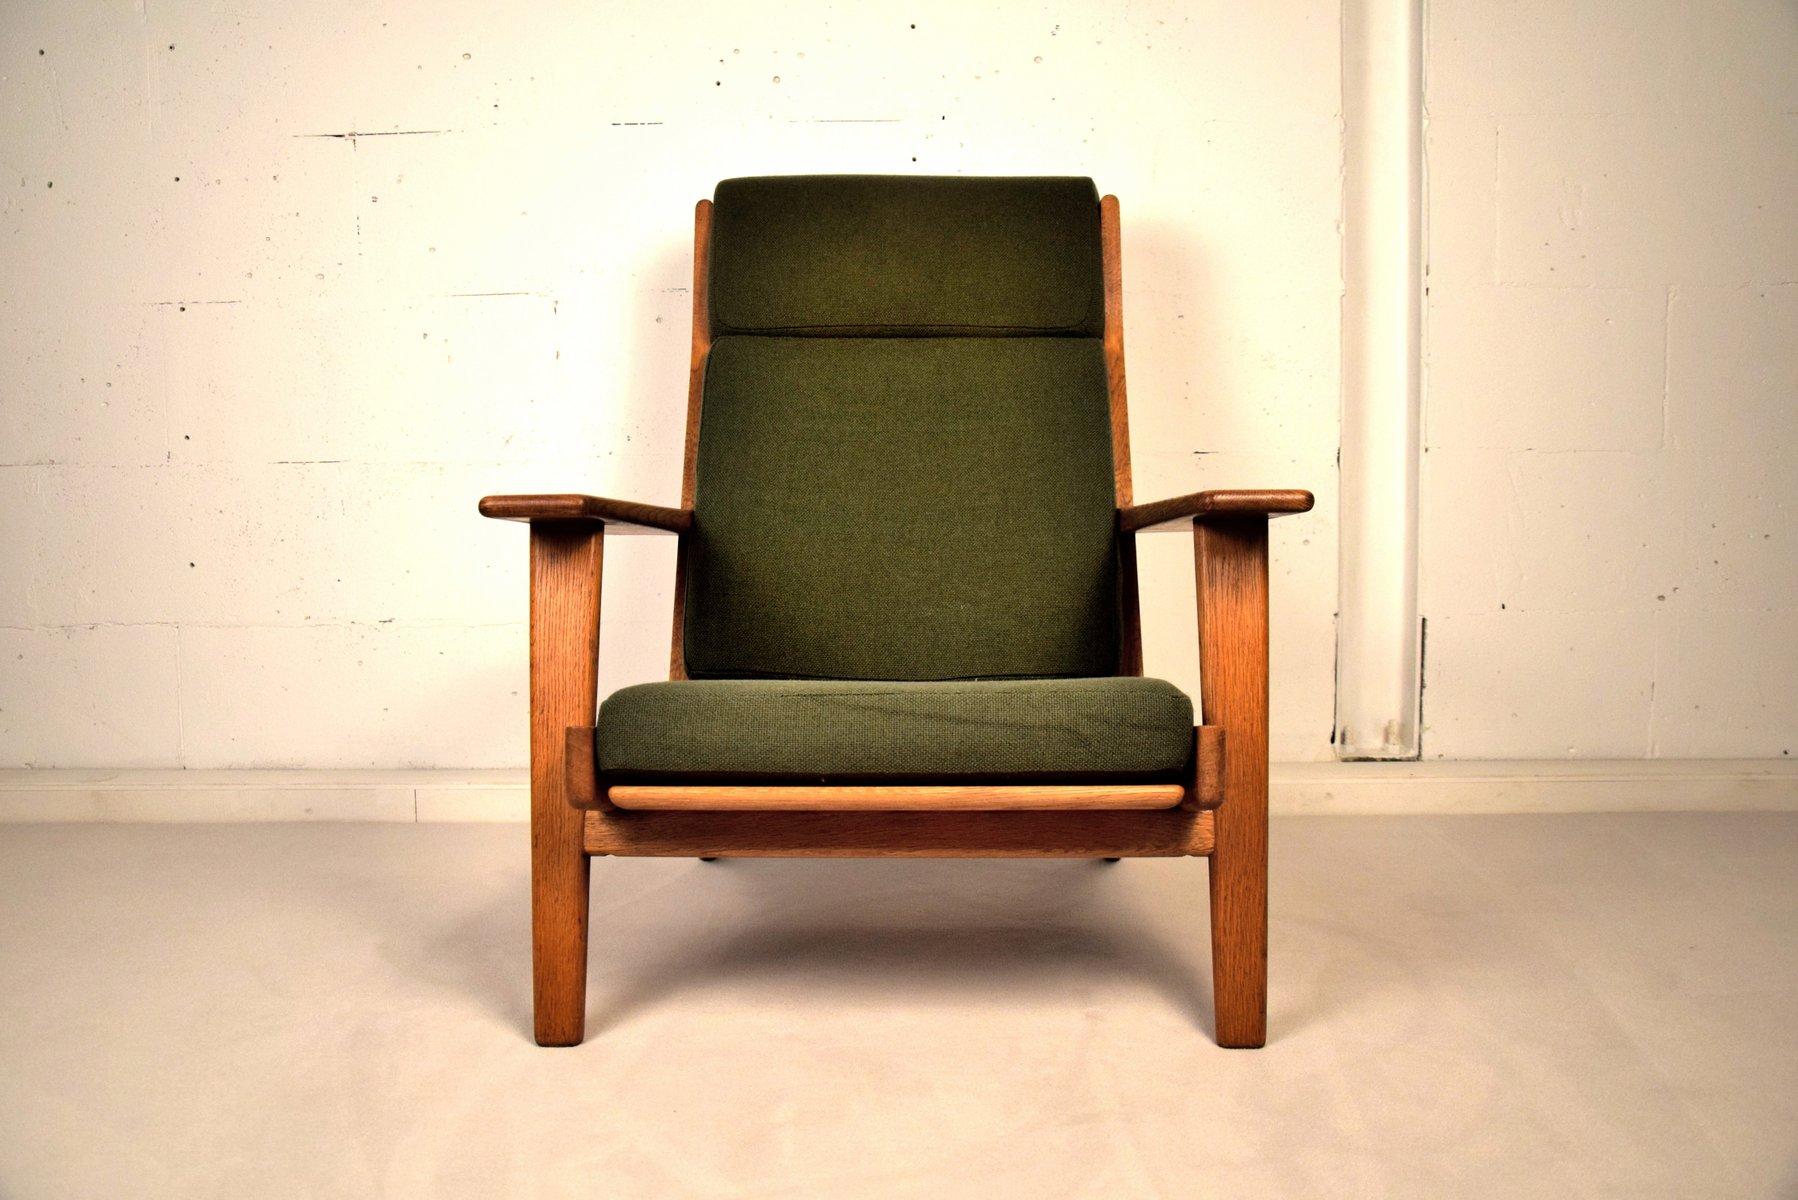 ge290 sessel mit hoher r ckenlehne von hans j wegner. Black Bedroom Furniture Sets. Home Design Ideas